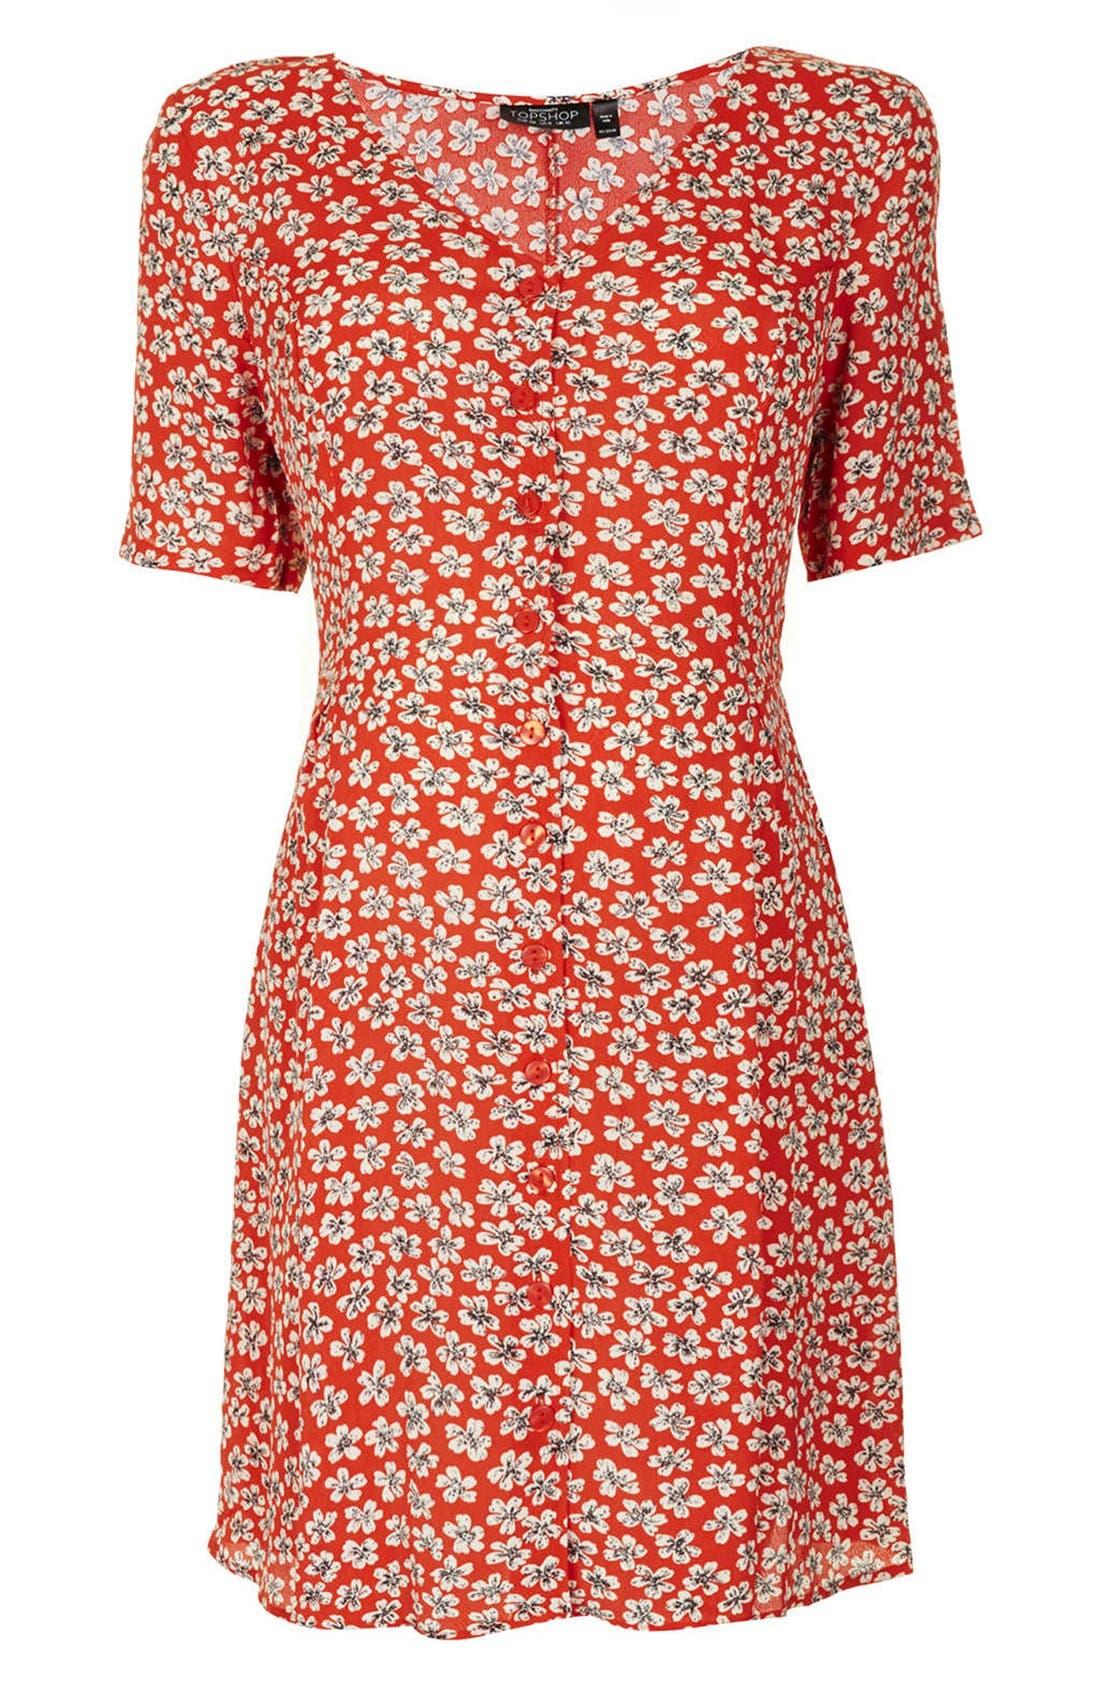 Main Image - Topshop 'Daisy' Floral Maternity Tea Dress